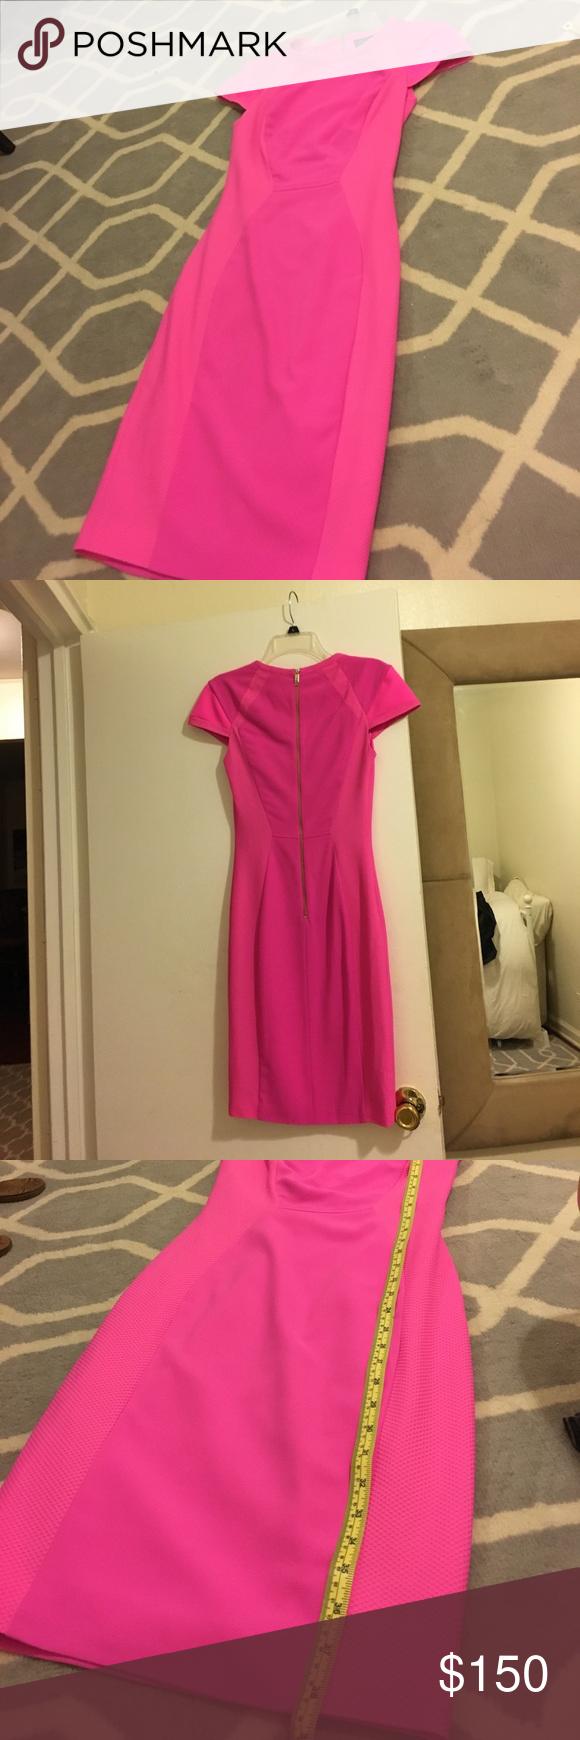 Ted Baker London Hot Pink Pencil dress